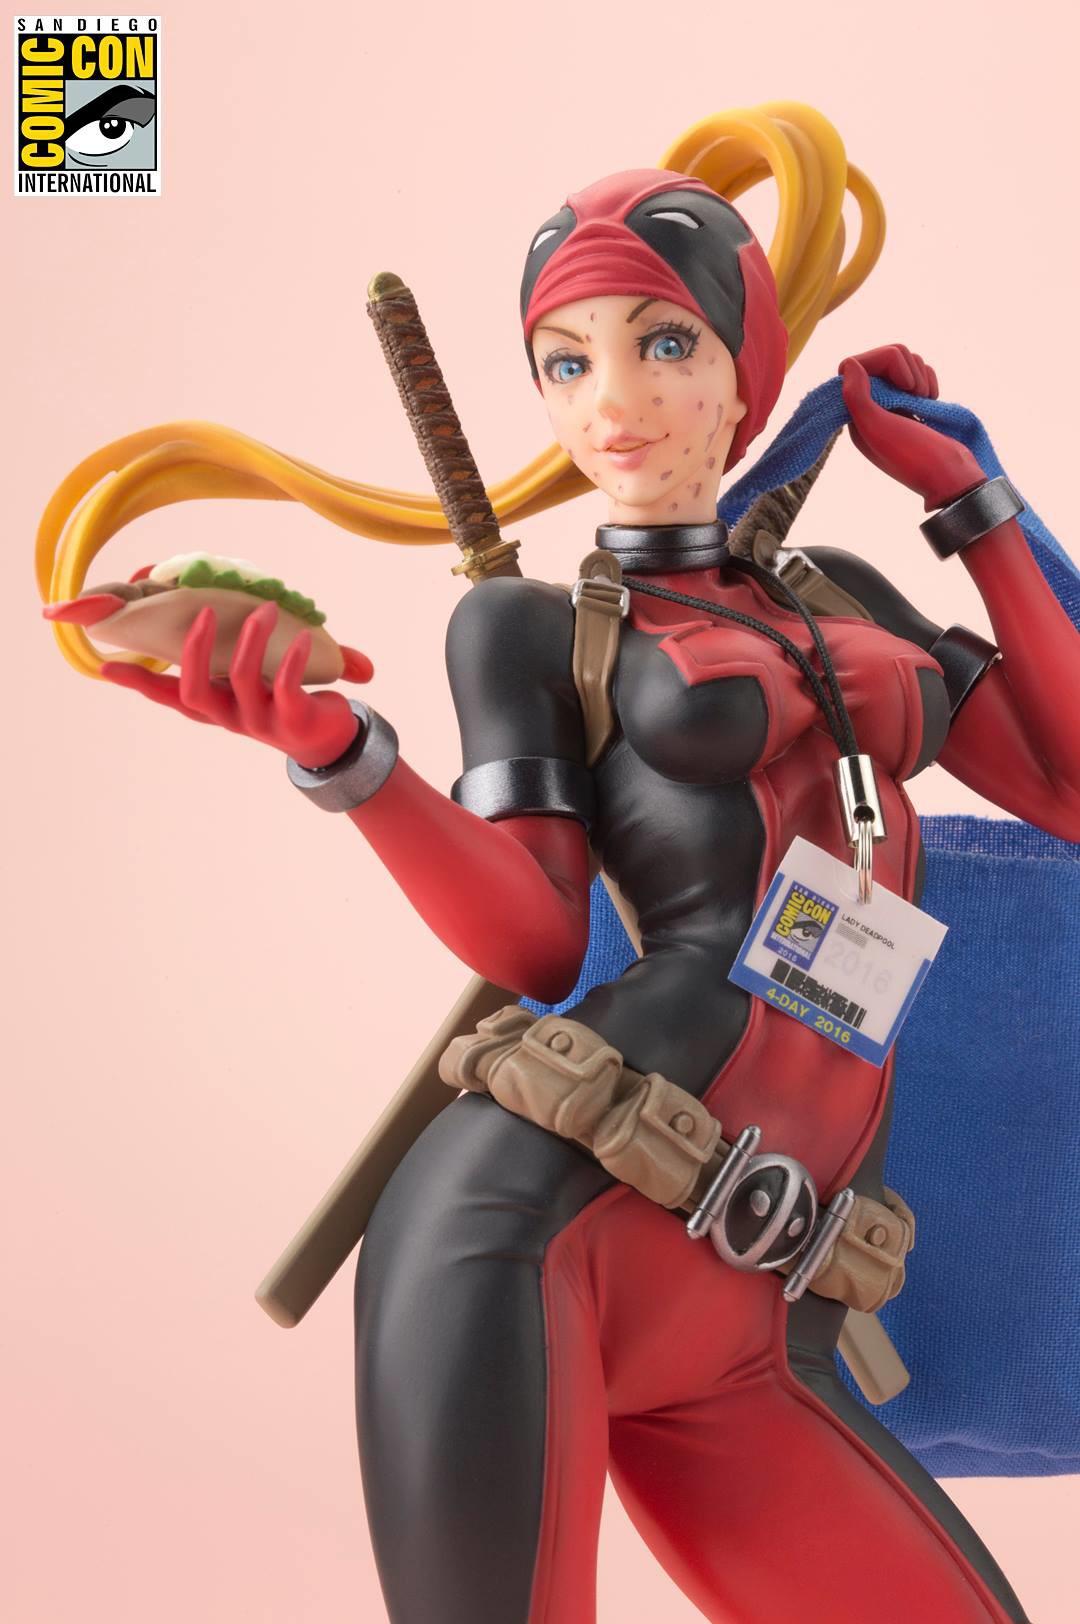 Marvel Bishoujo Statue LADY DEADPOOL 2016 SDCC EXCLUSIVE MIMB Kotobukiya Details about  /RARE